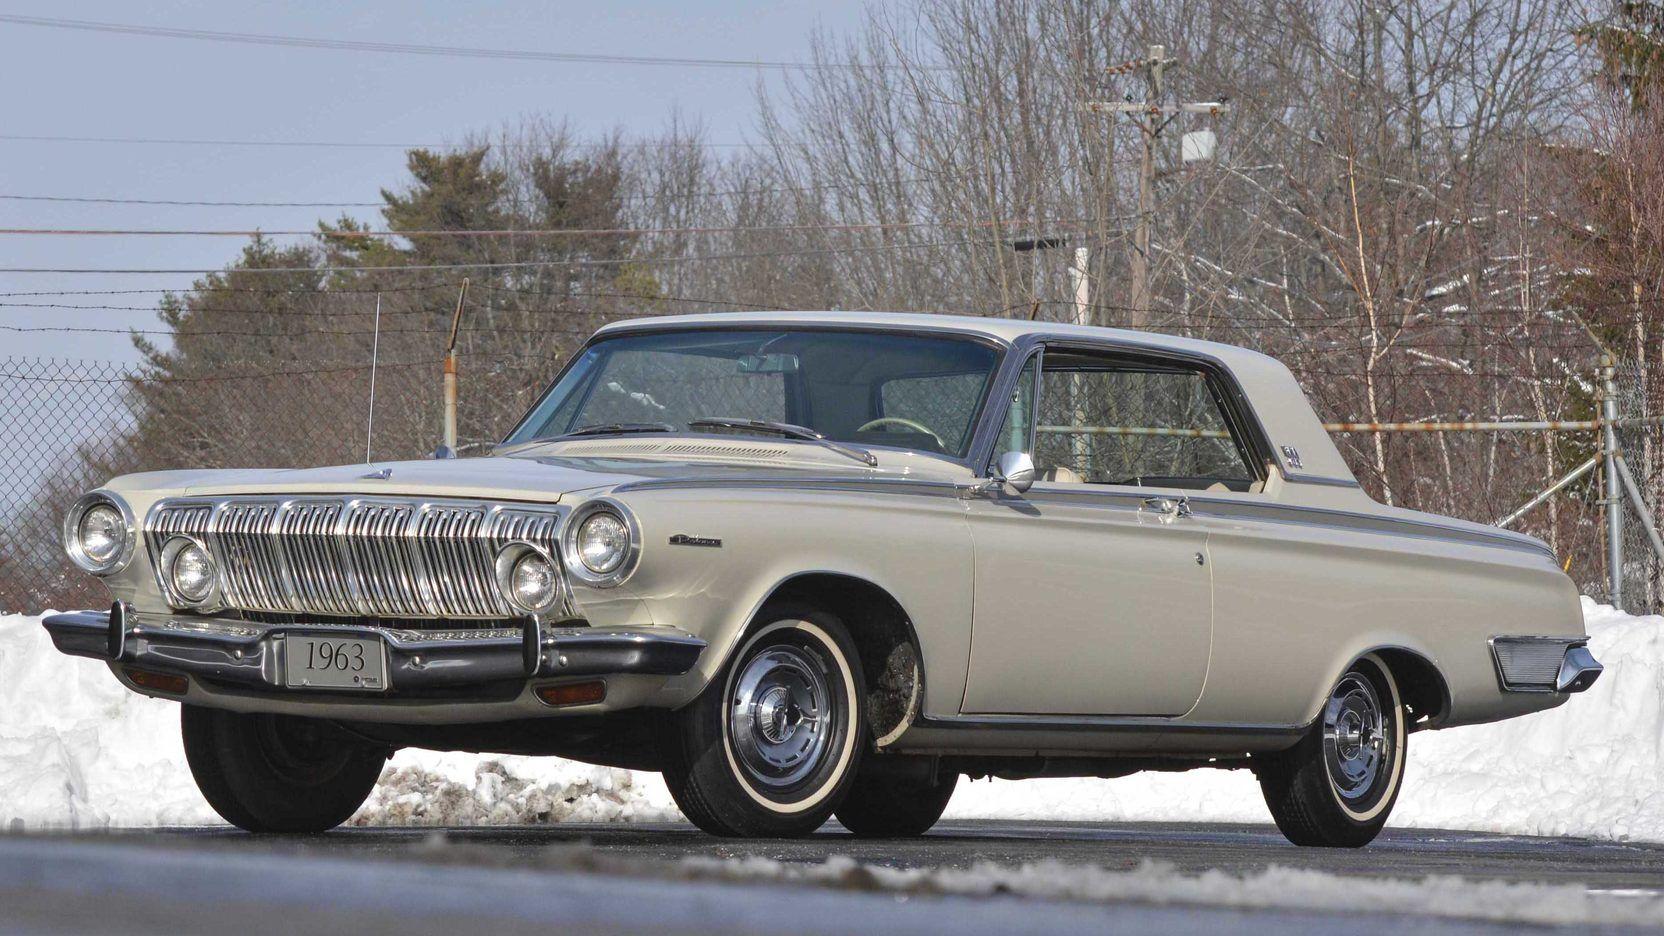 1963 Dodge Polara 500   Classic Cars   Pinterest   Cars, Station ...